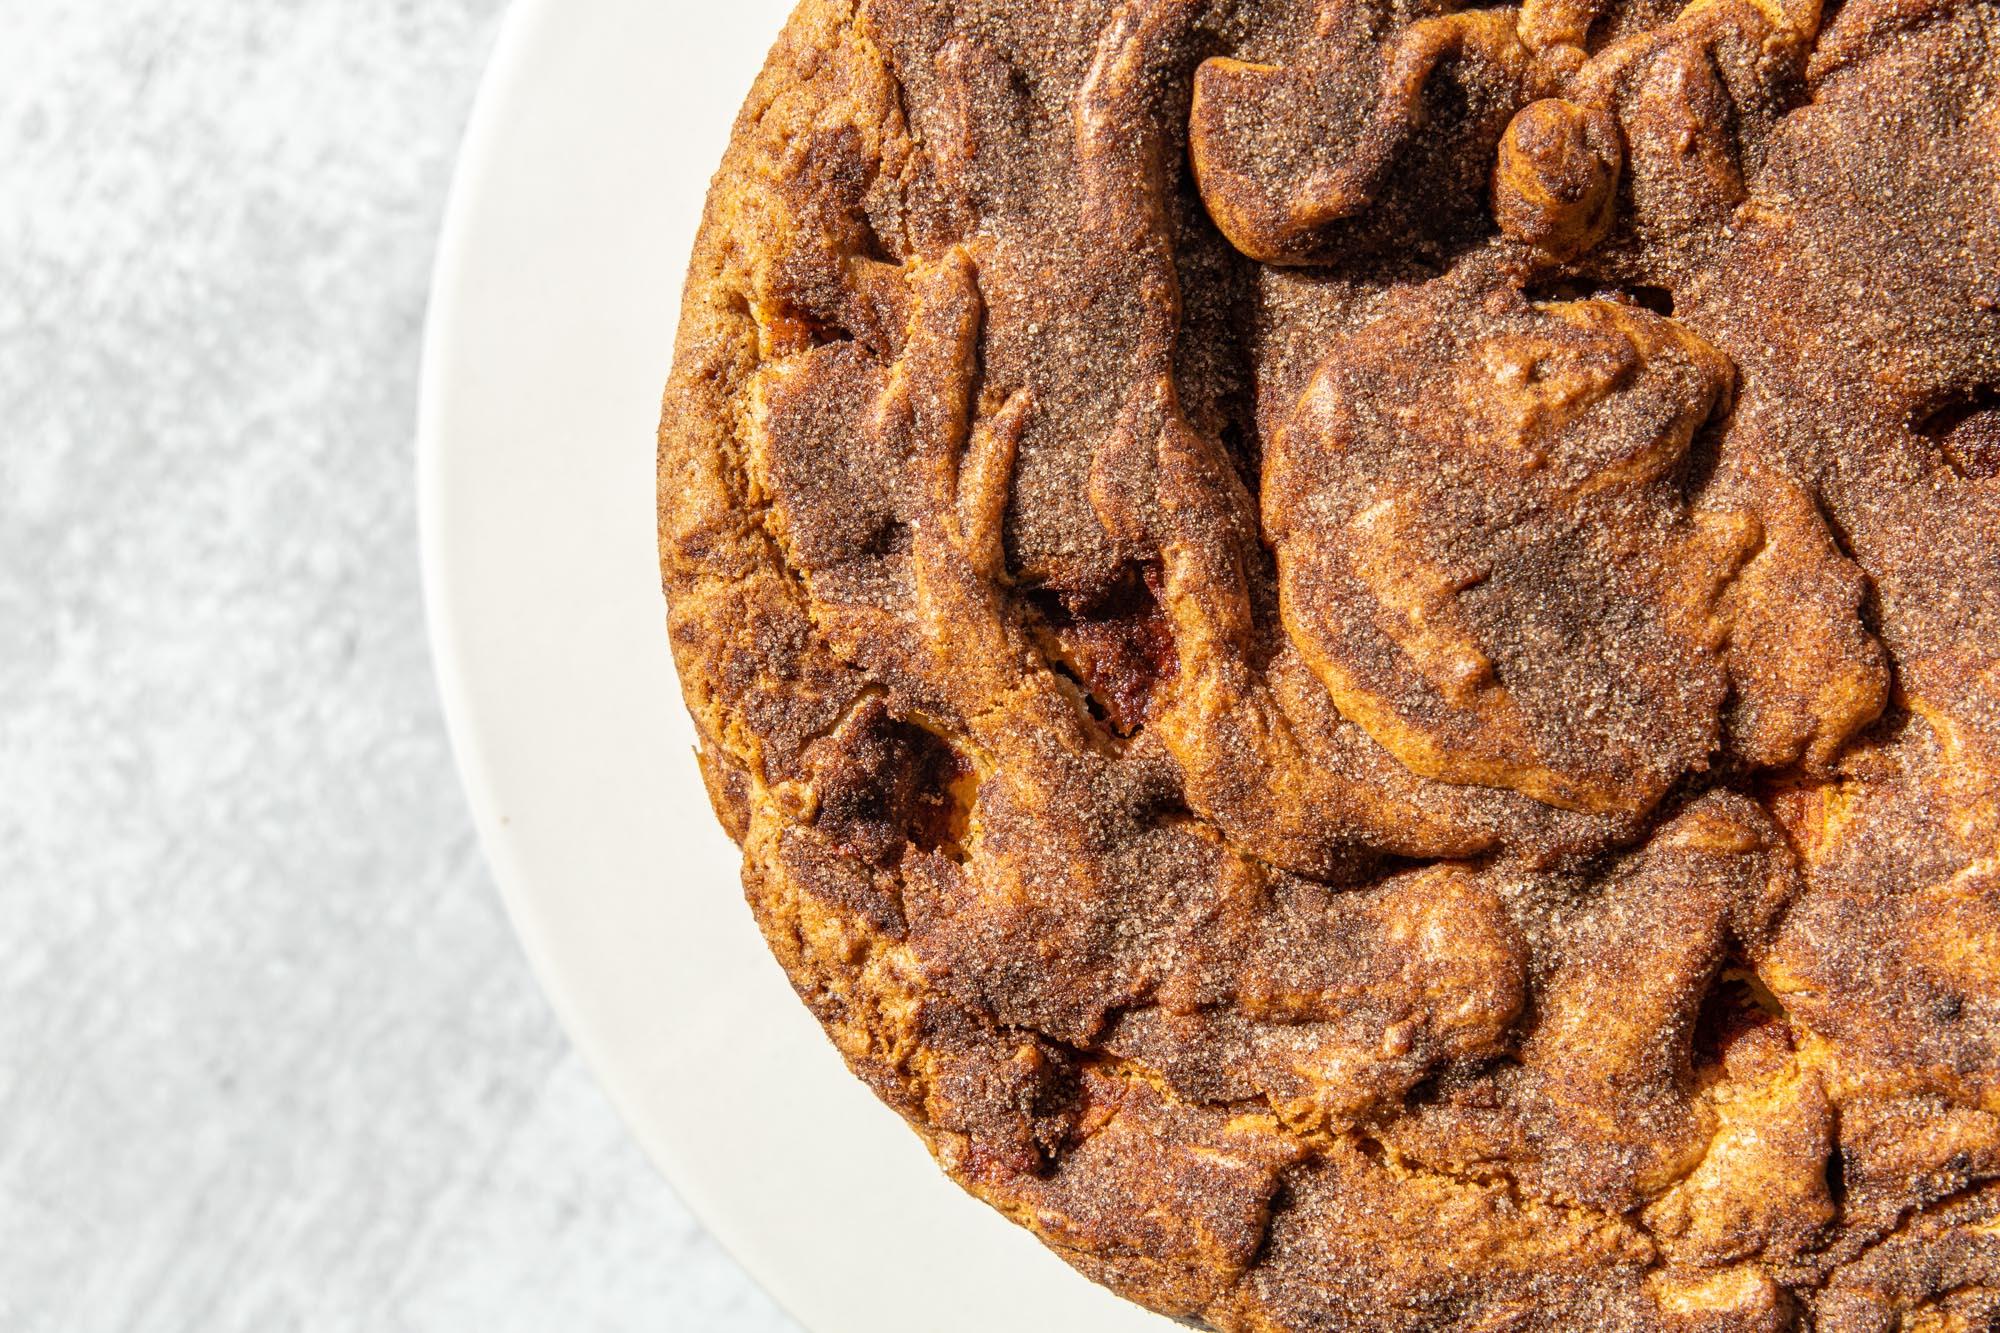 https://www.kitchenandaway.com/story/cinnamon-apple-cake